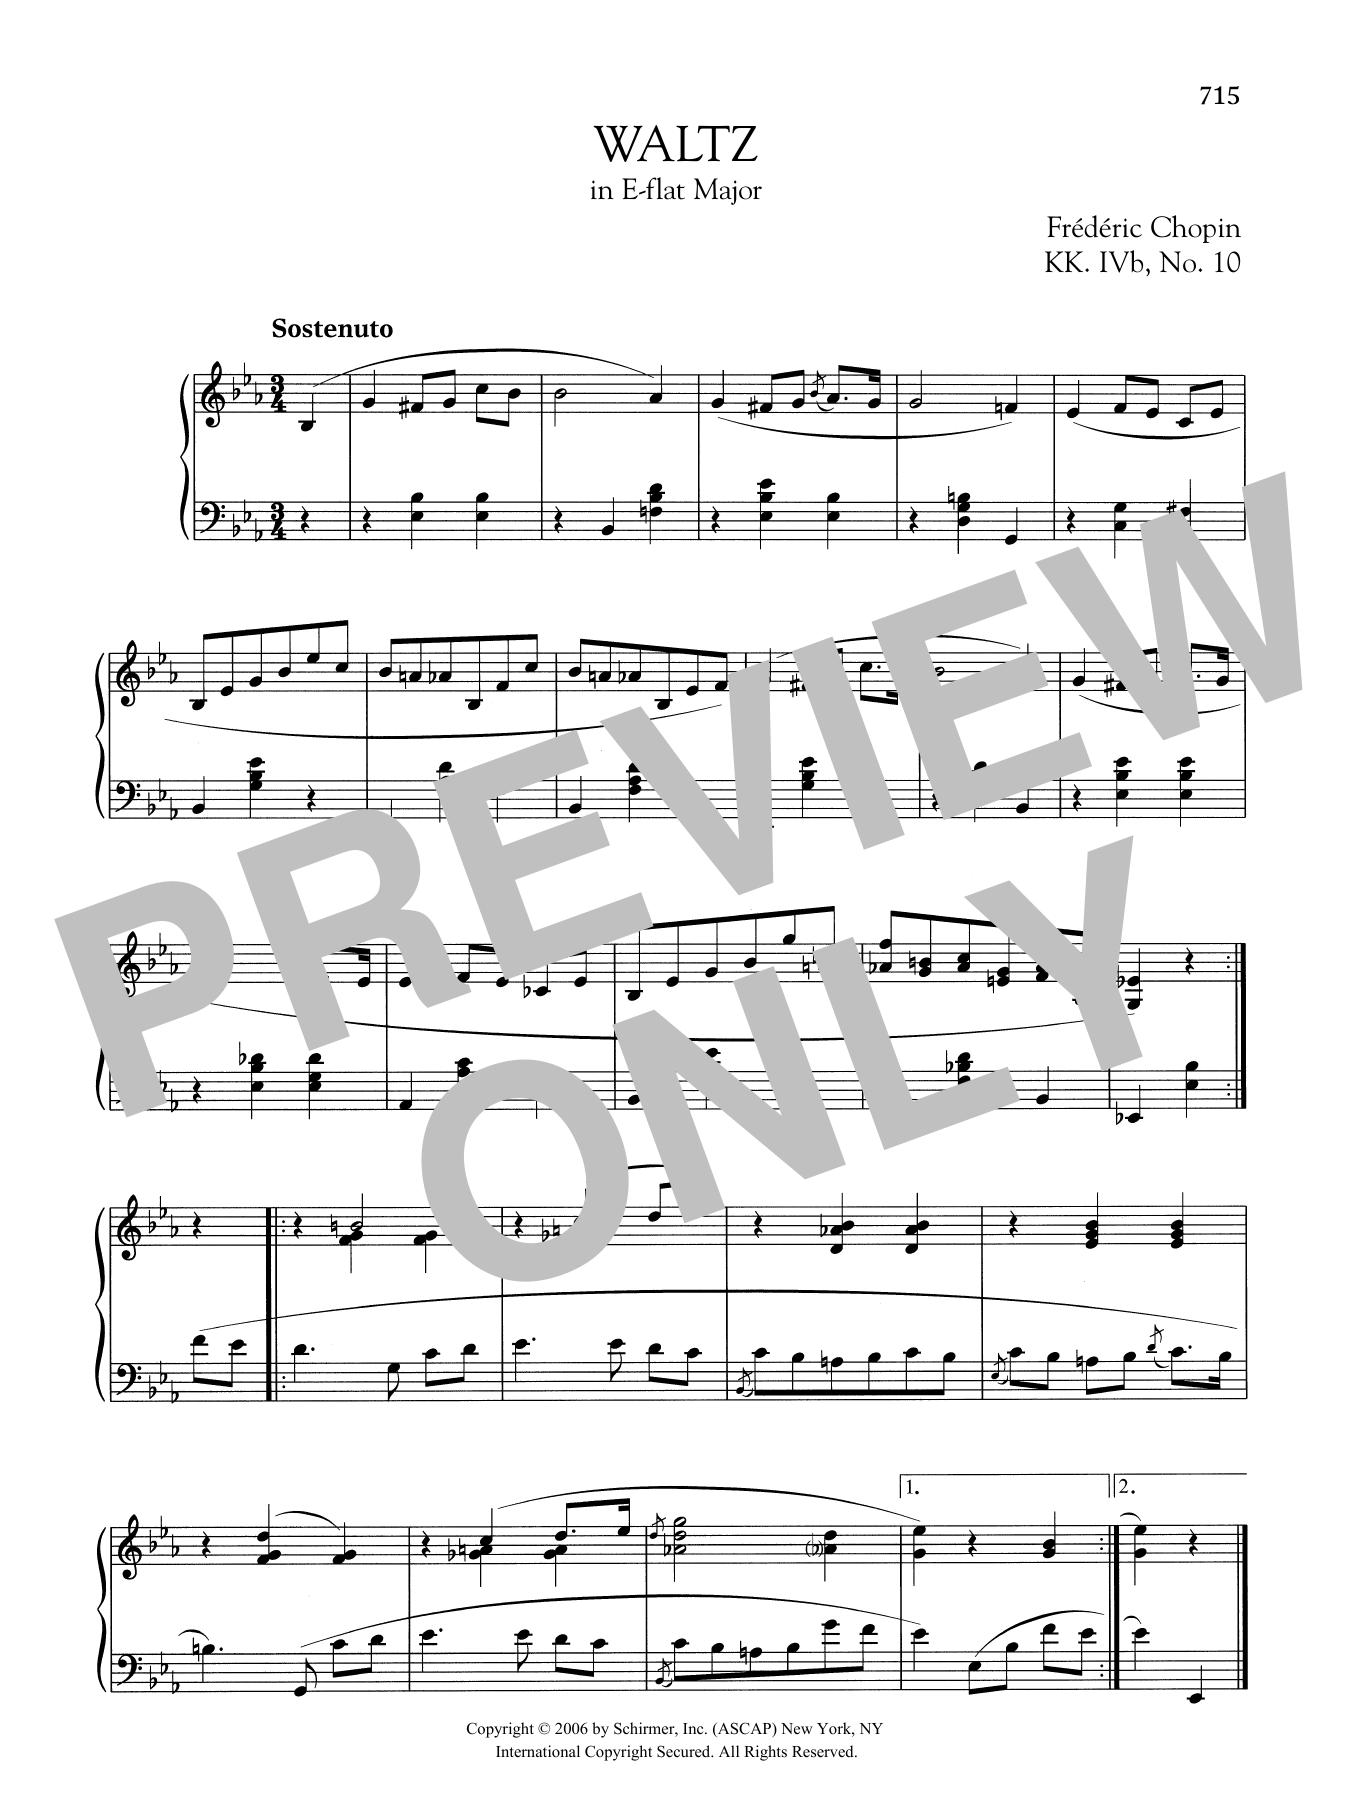 Waltz in E-flat Major, KK. IVb, No. 10 Sheet Music